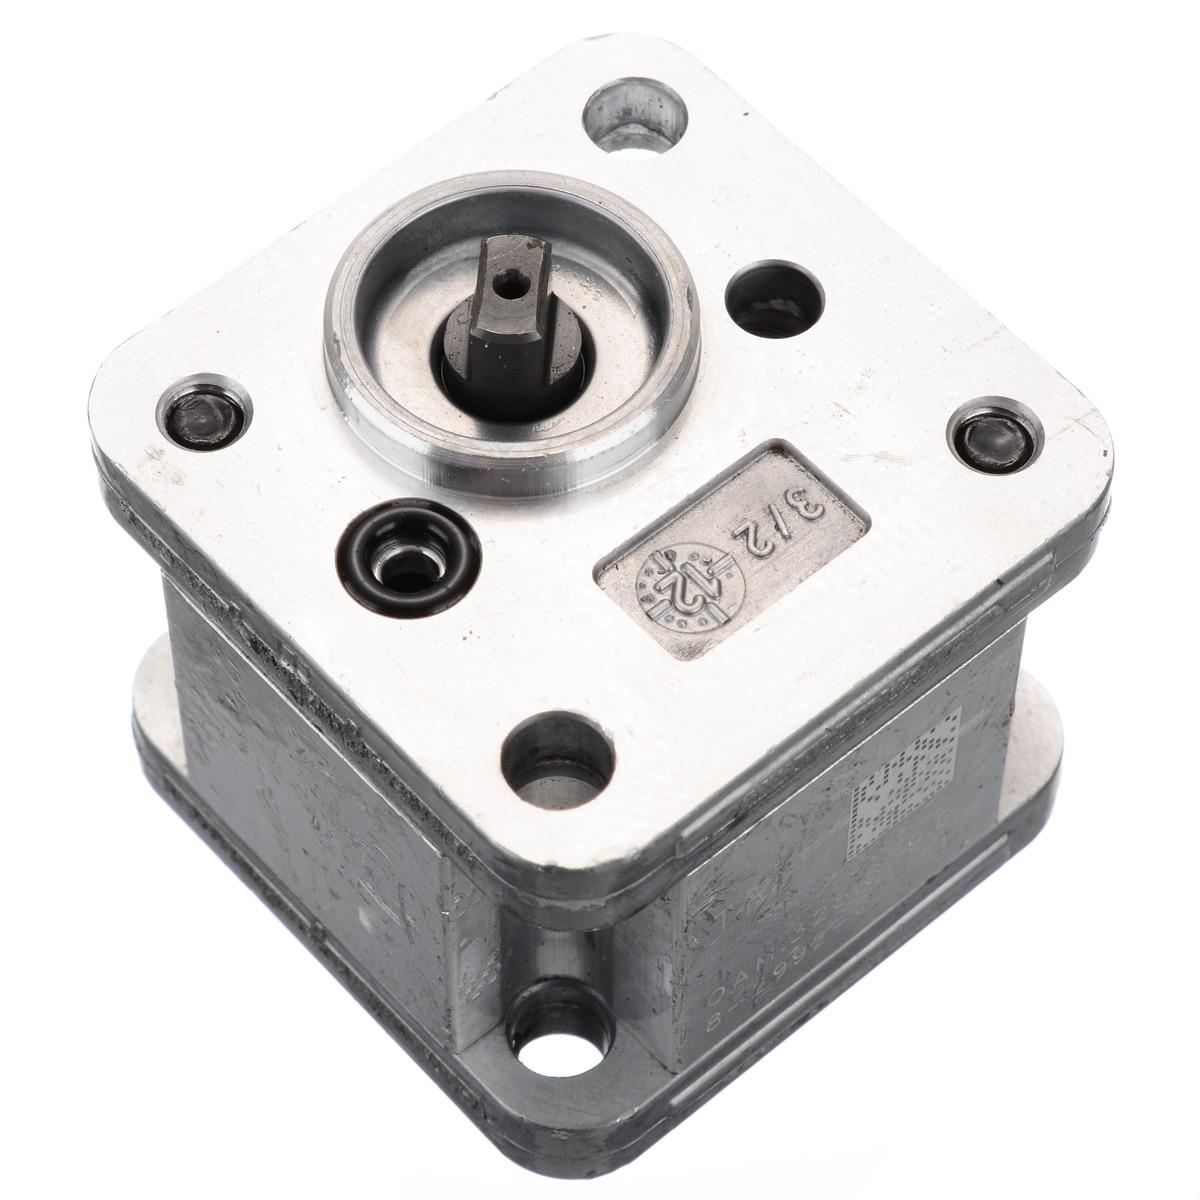 New Hydraulic Gear Pump Metal Gear Pump Hydraulic Model Excavating Machinery For Home DIY Tools Durable